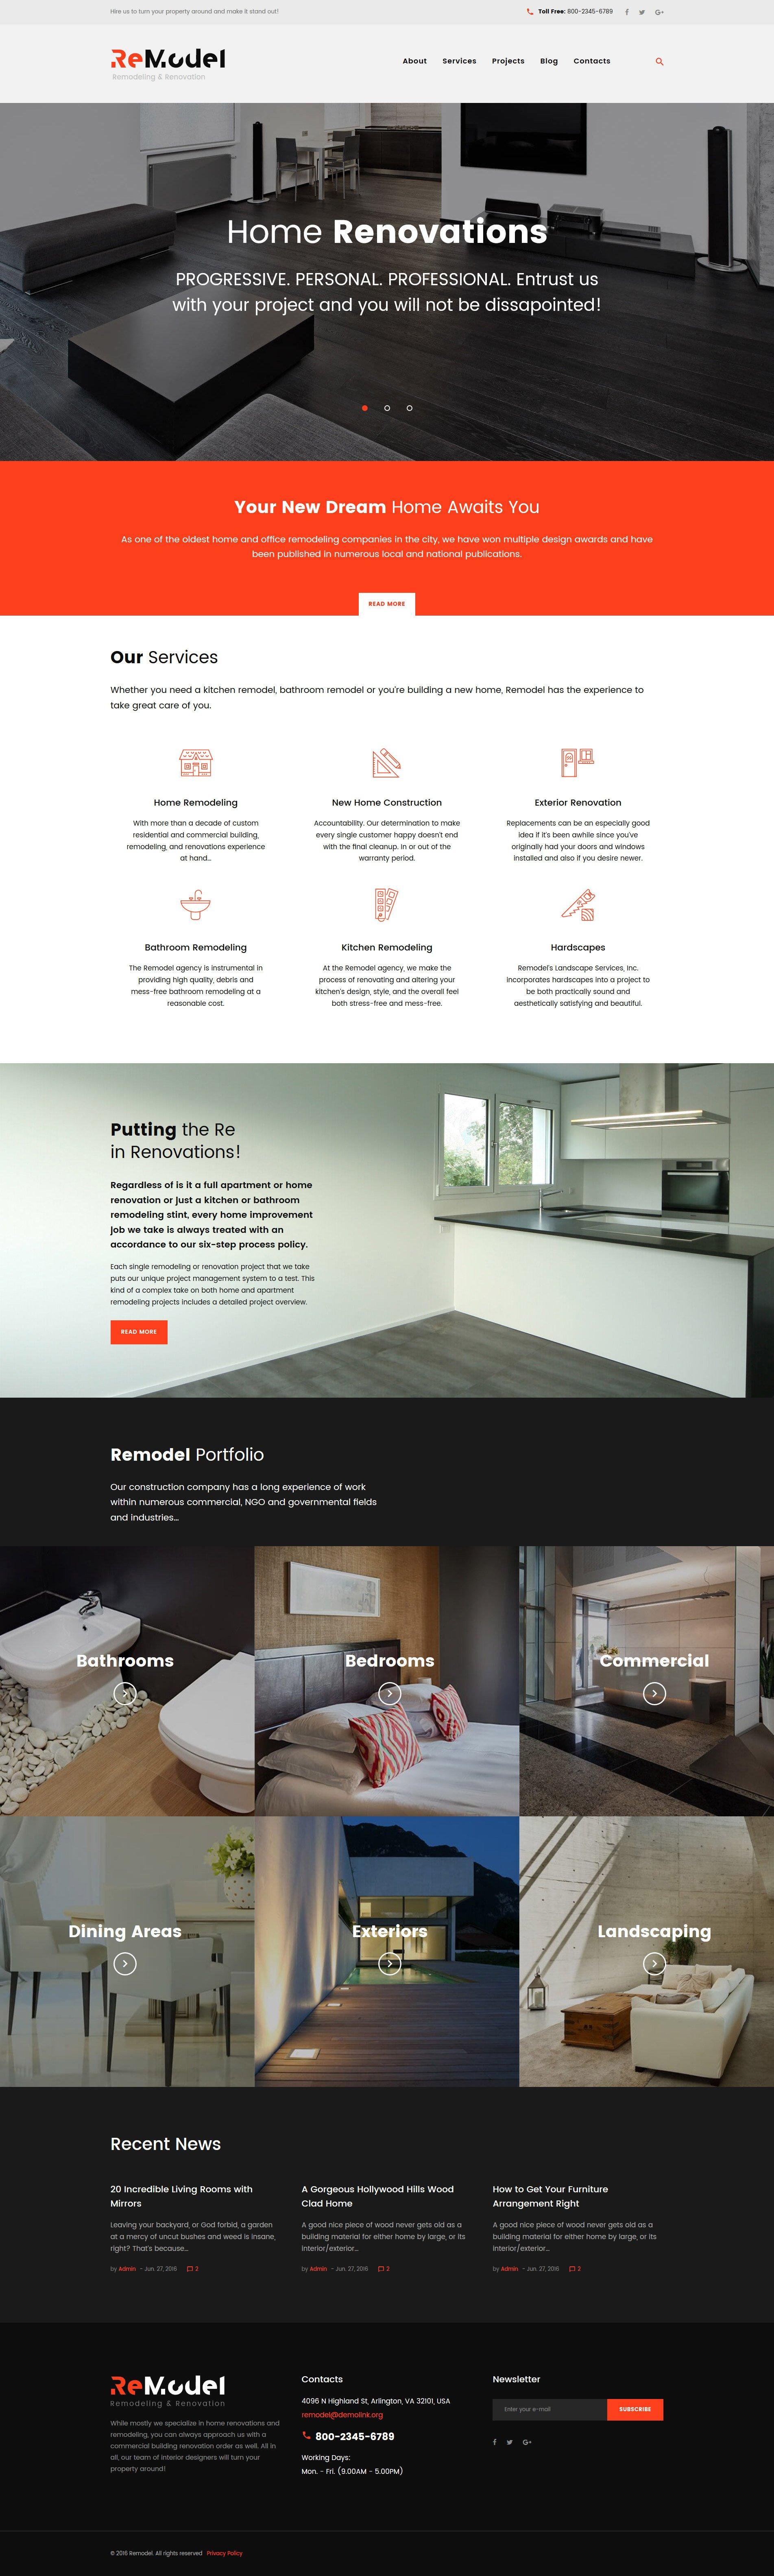 Remodel   Renovation U0026 Interior Design WordPress Theme New Screenshots BIG